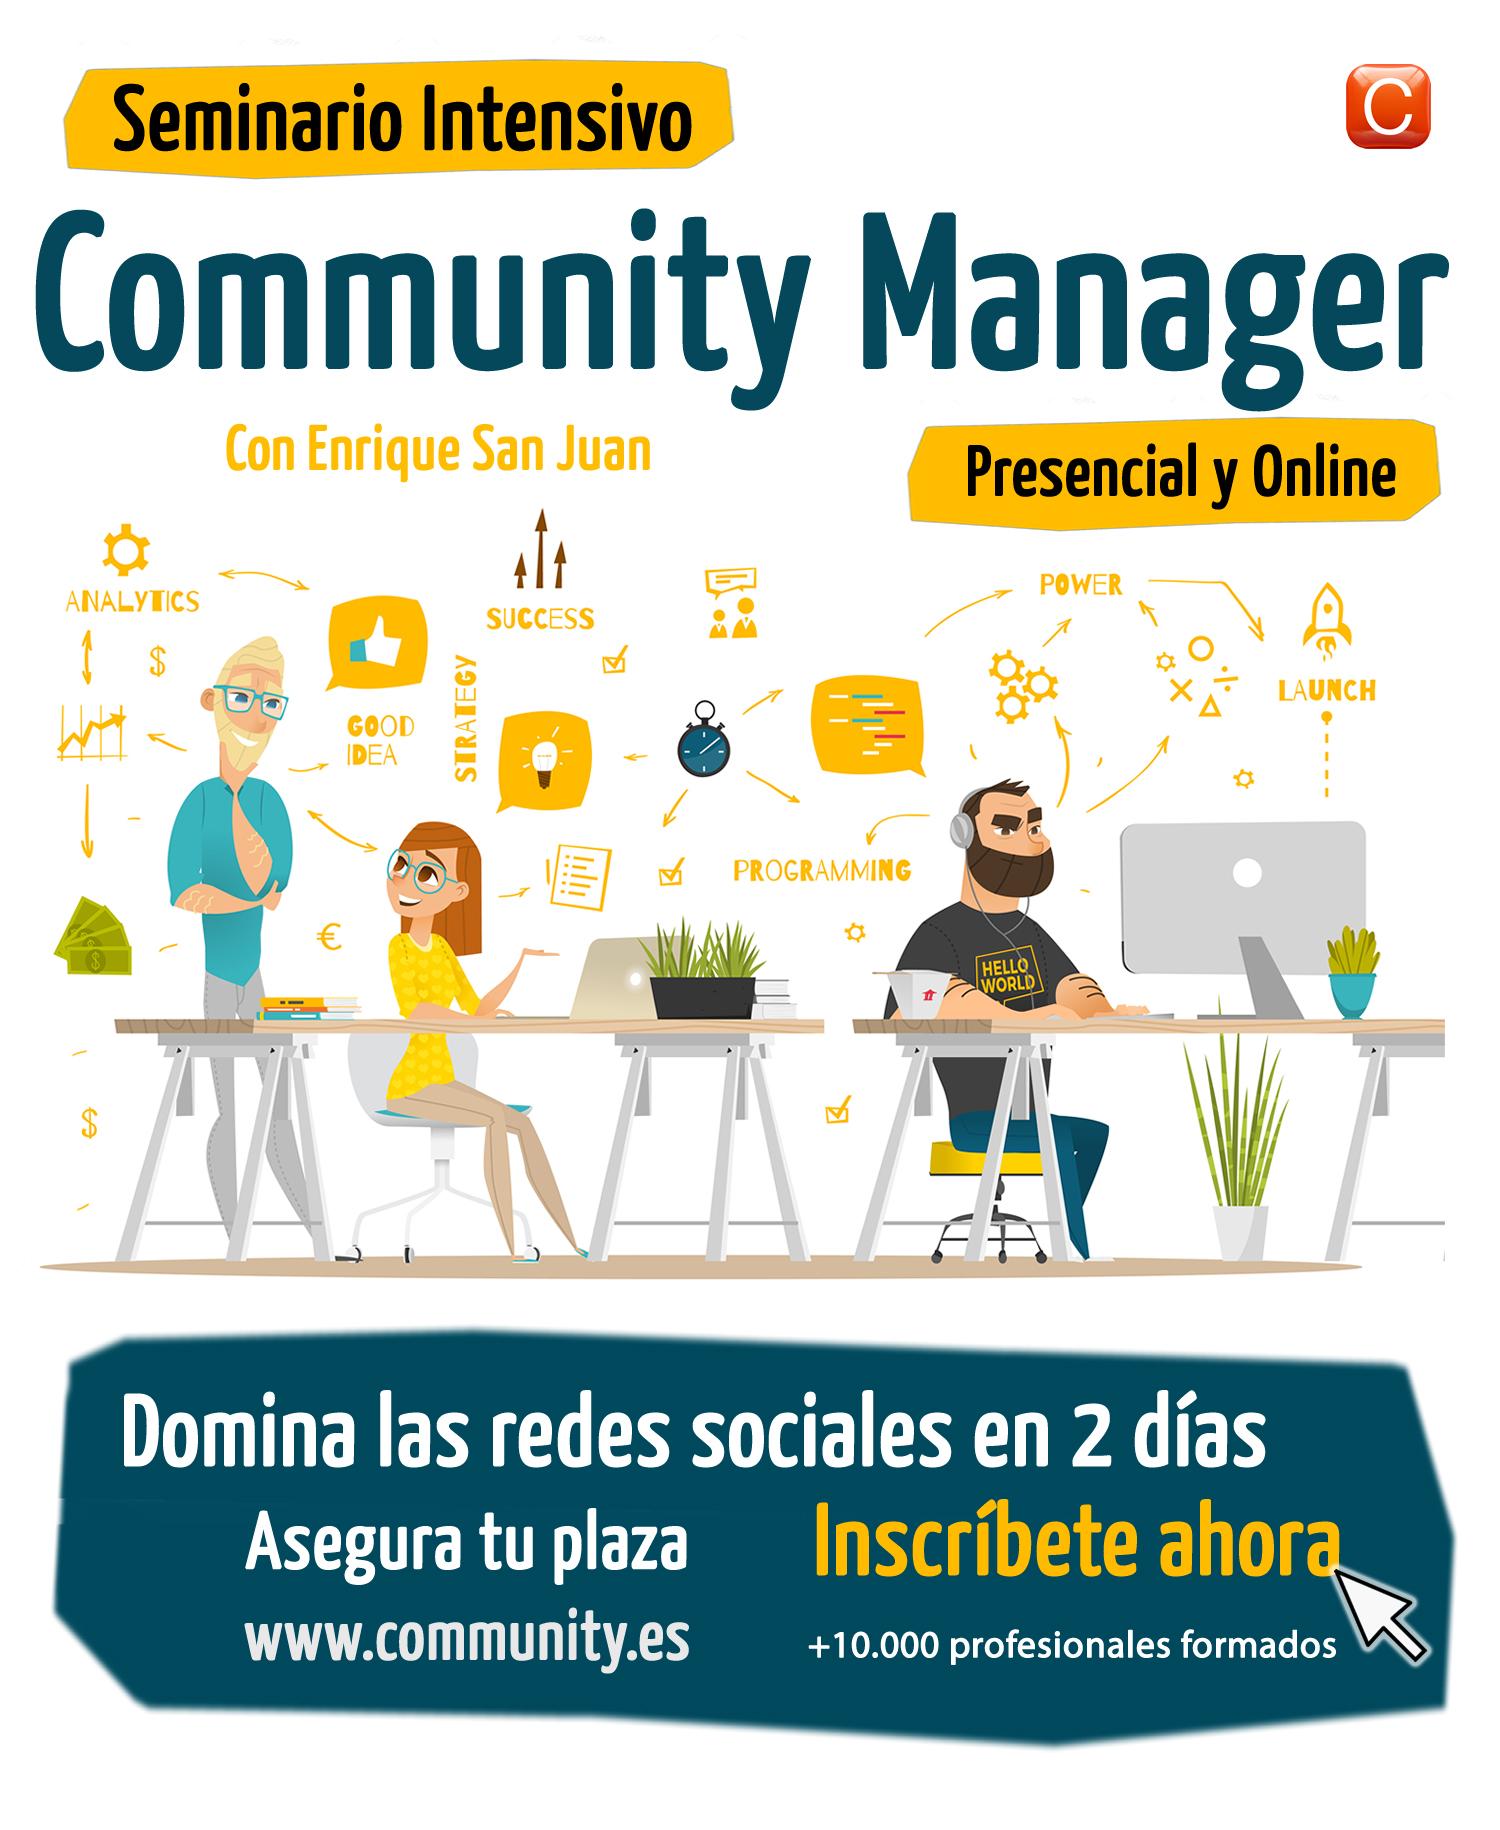 seminario Community Manager community internet